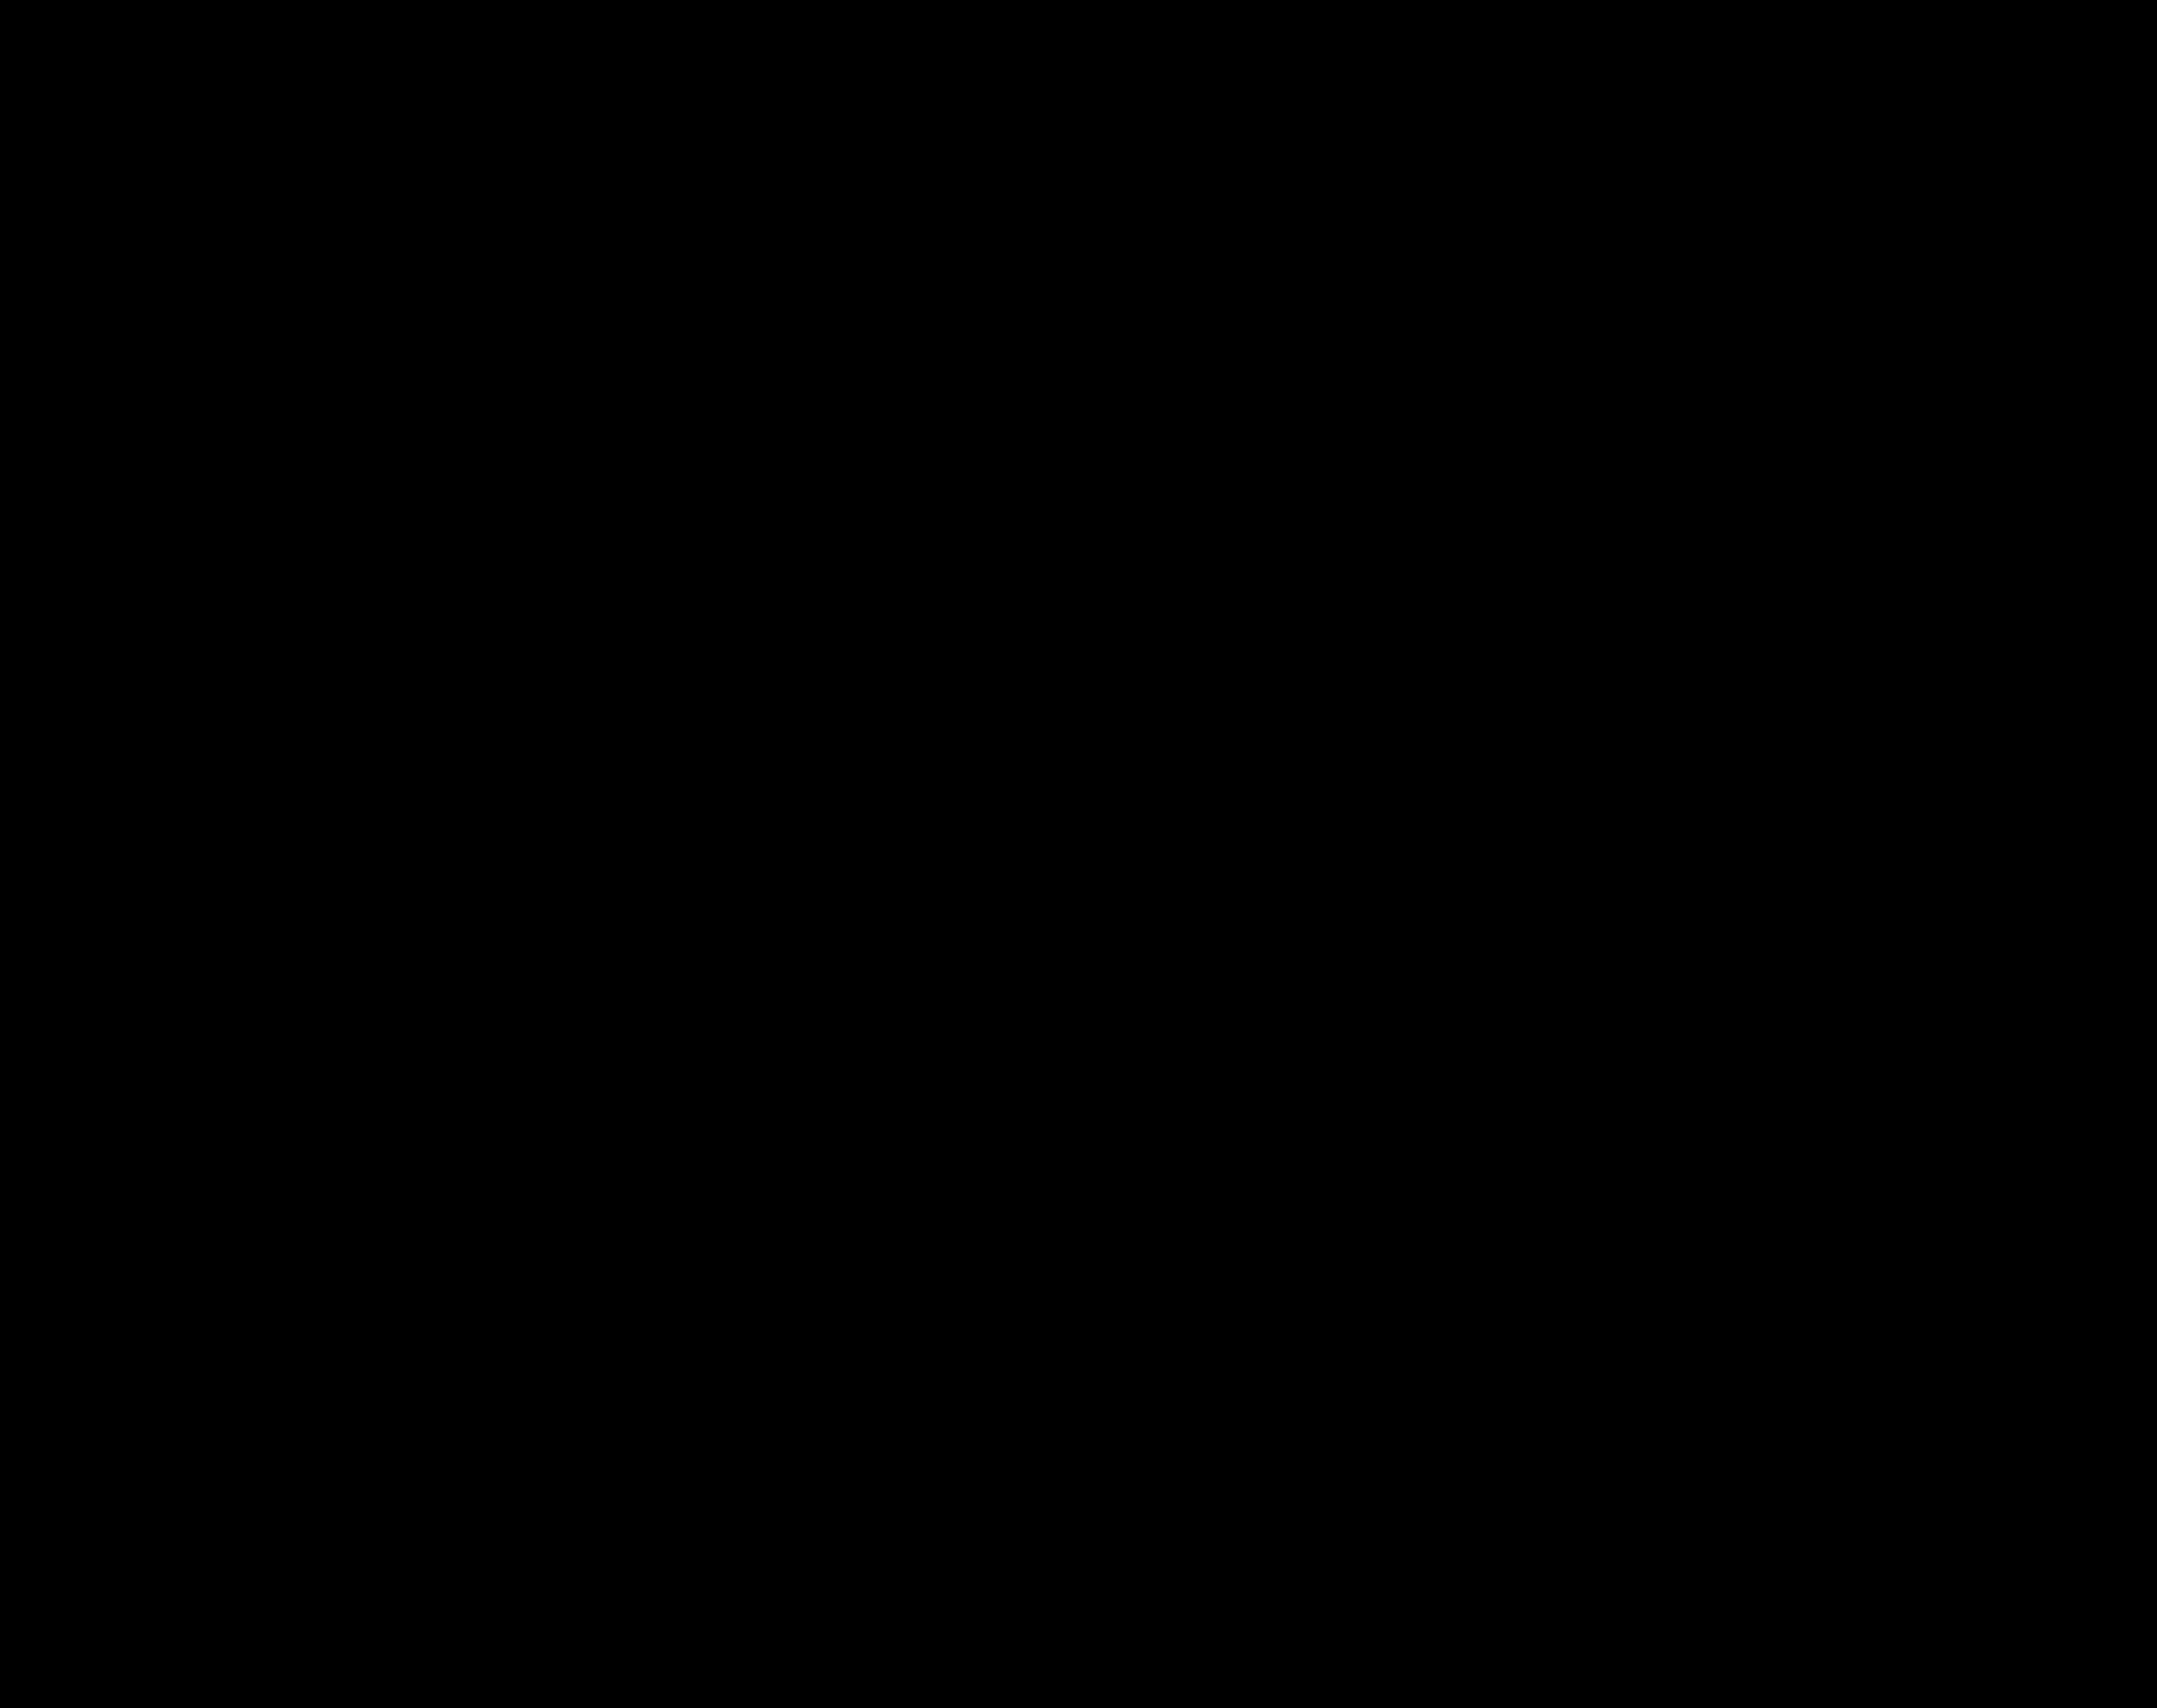 img_5439